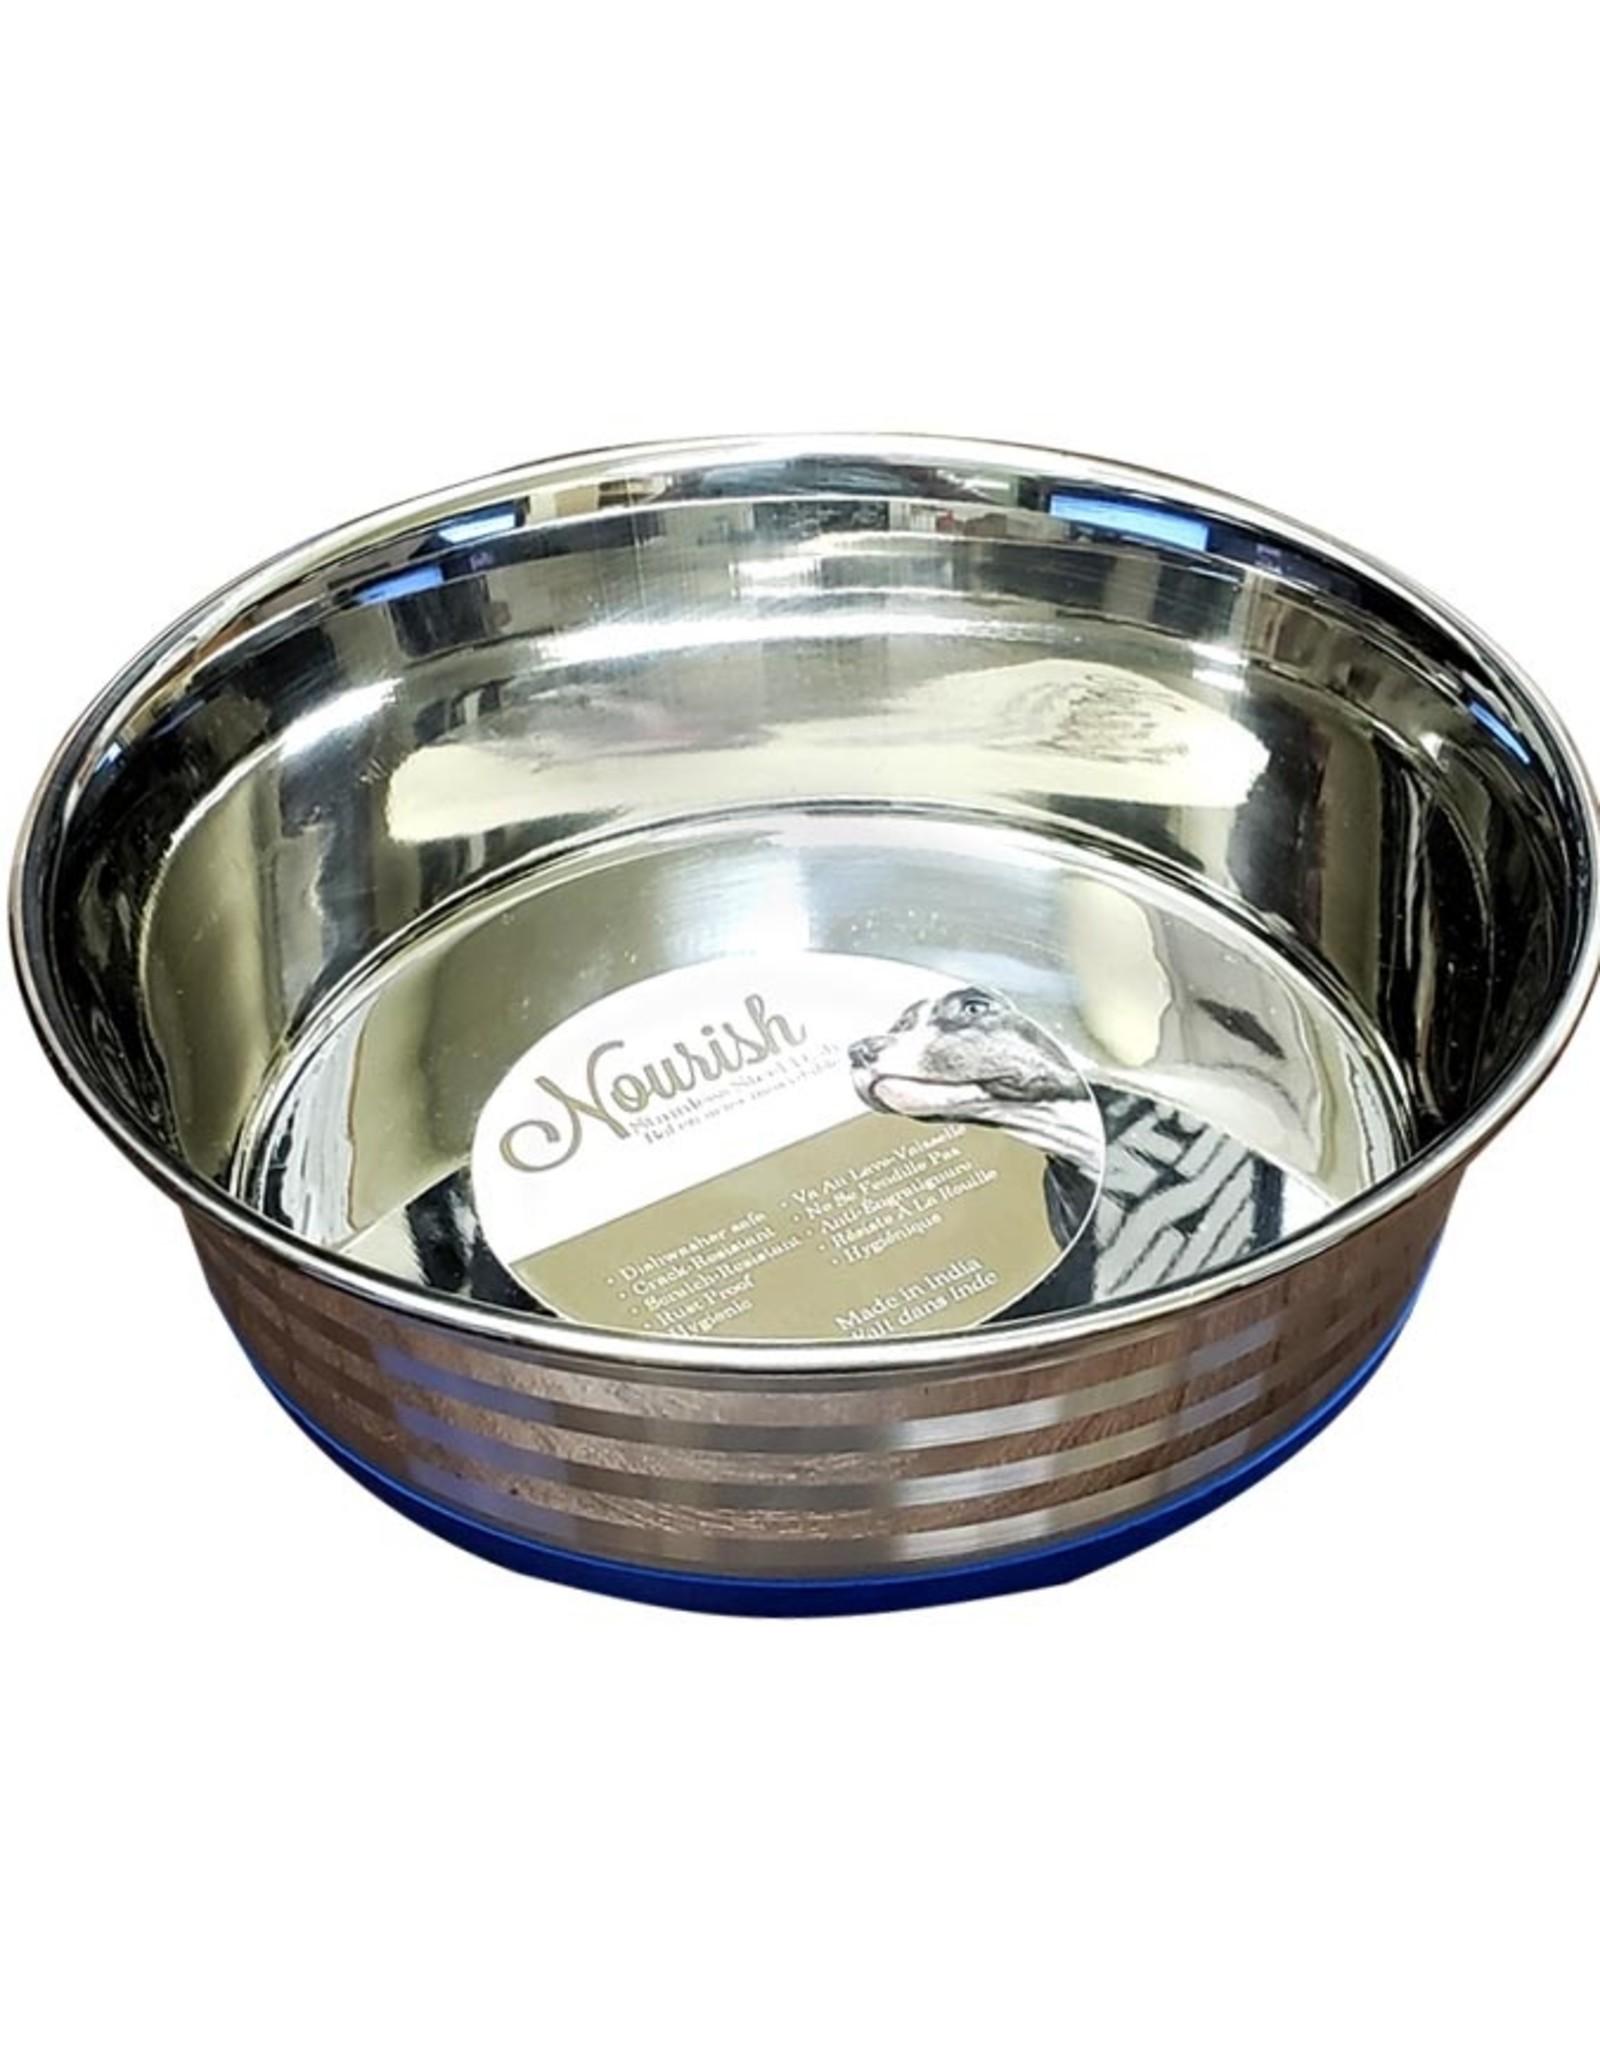 Stainless Steel Anti-Skid Bowl